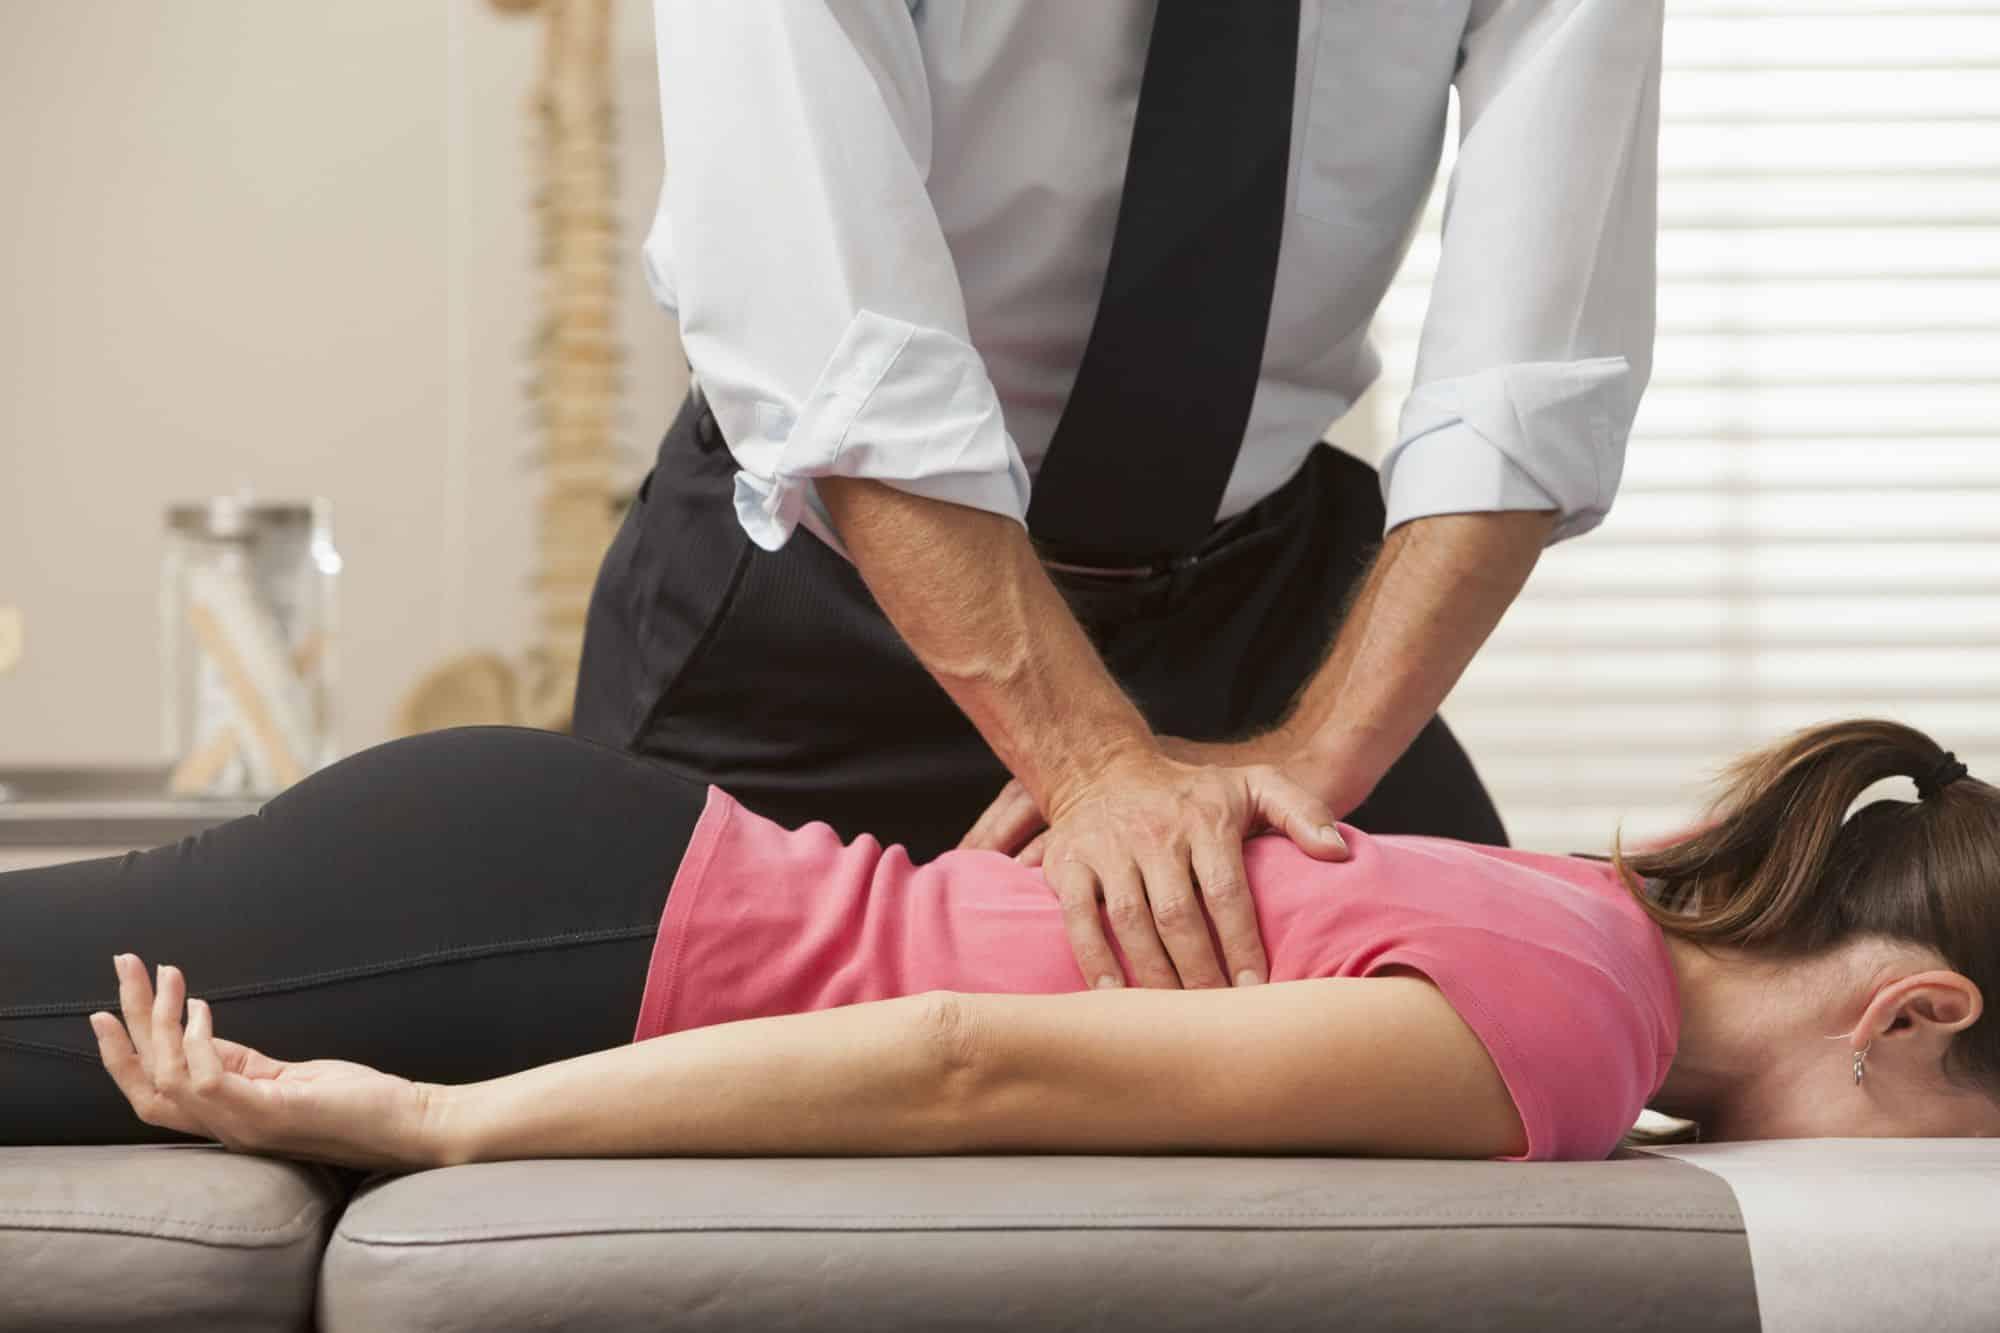 Chiropractor: Job Description, Salary, Skills, & More